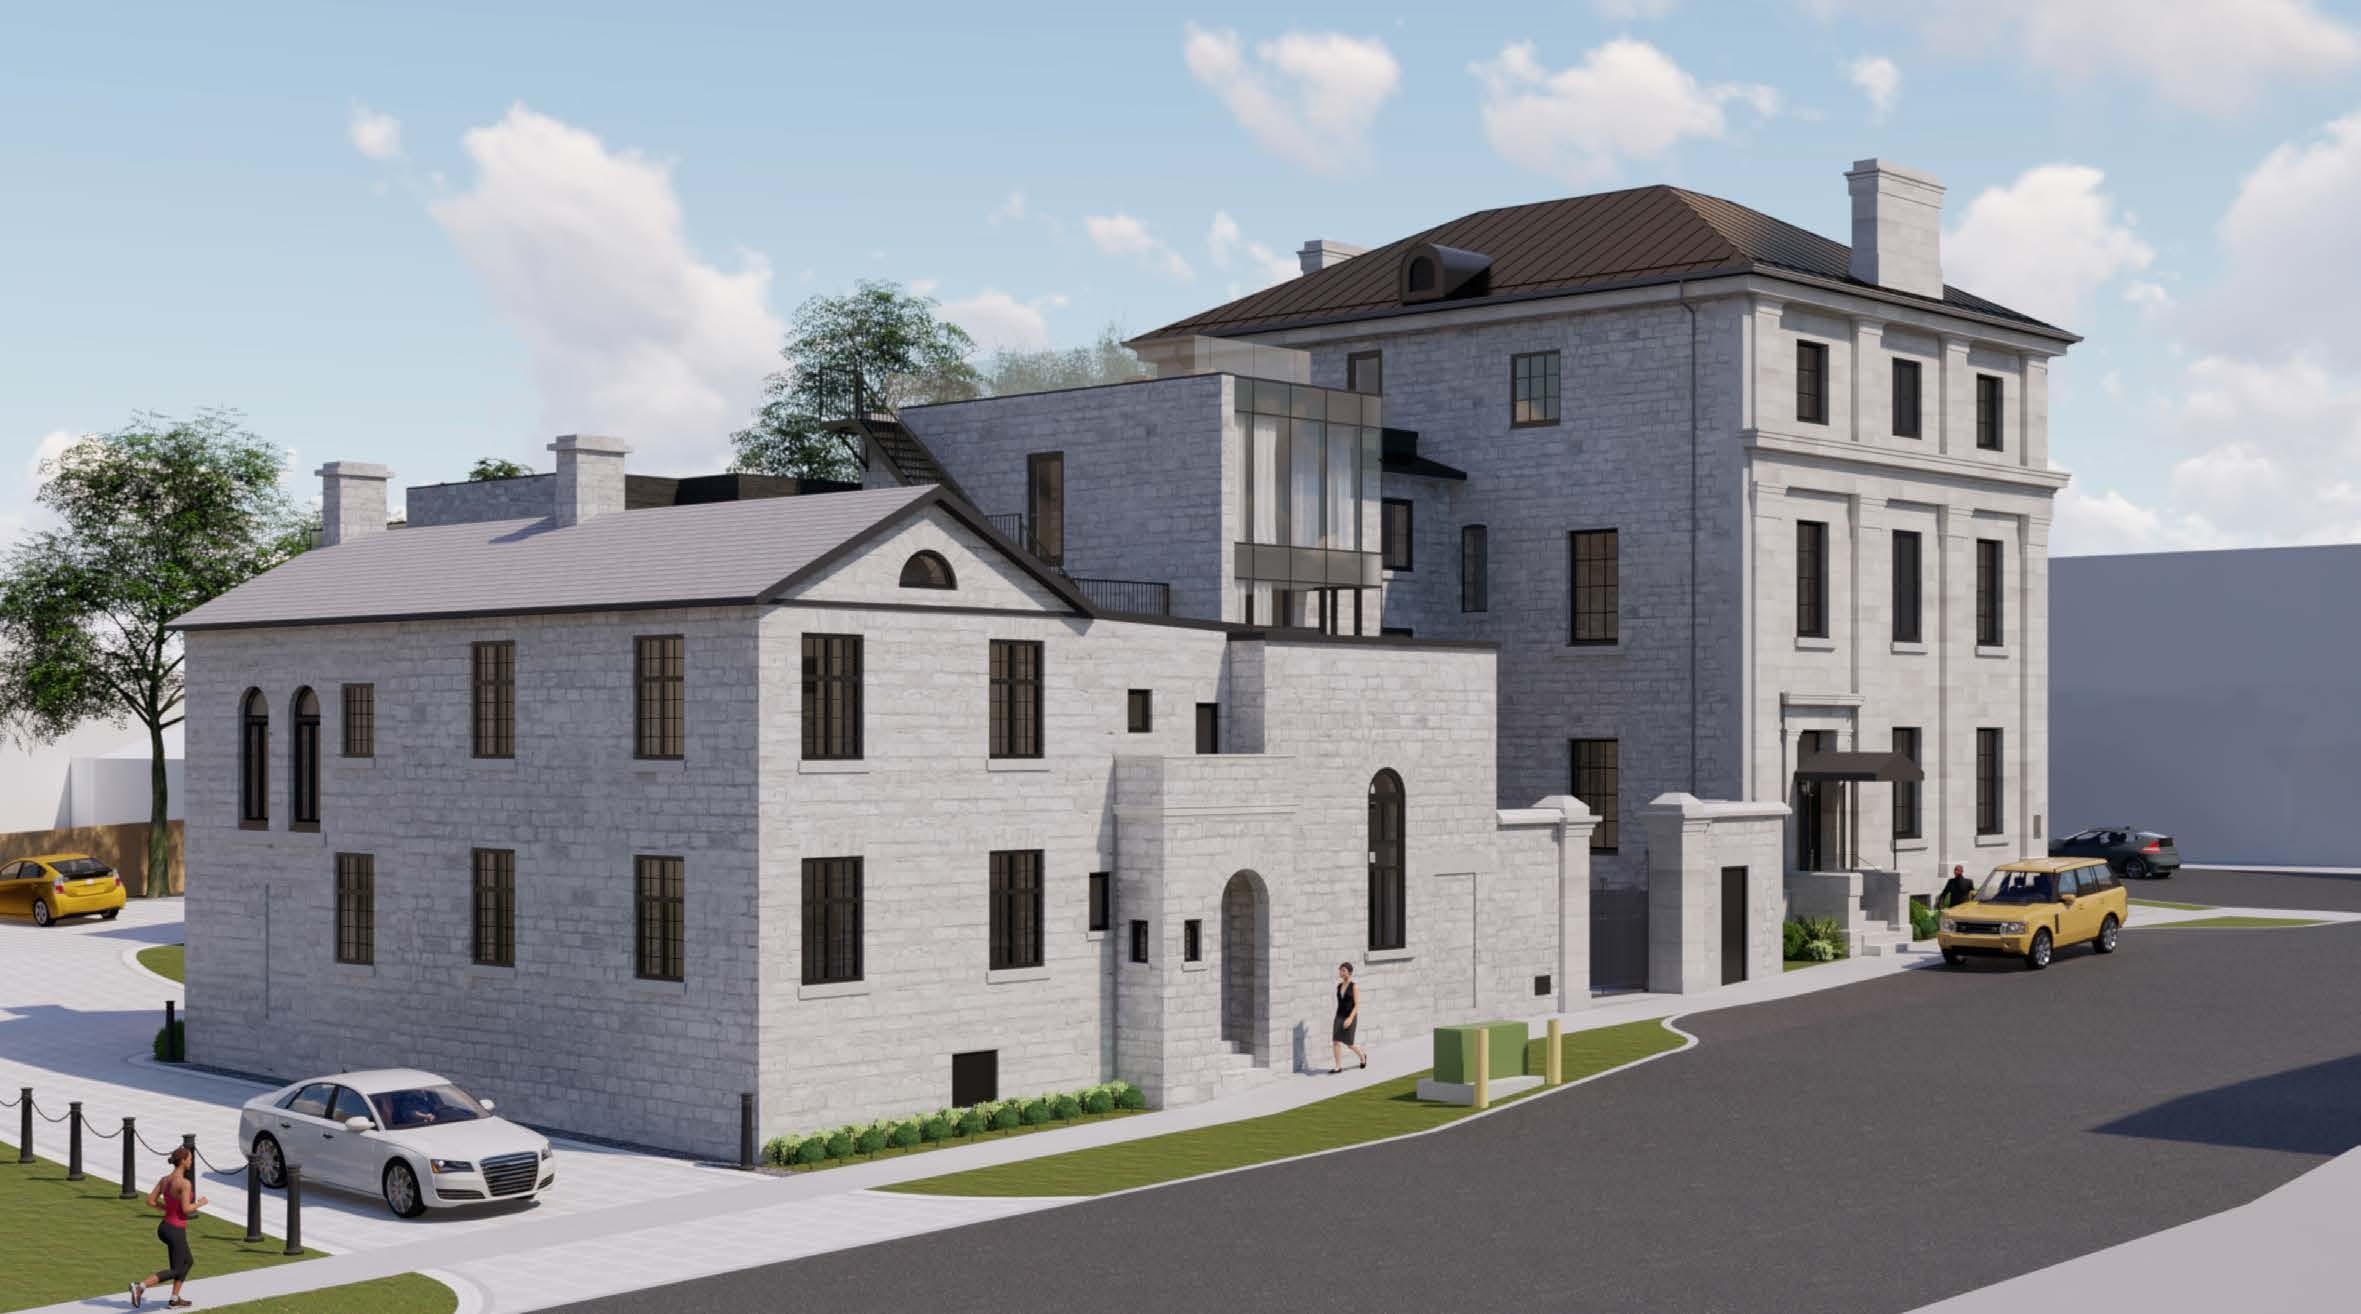 A rendering of Frontenac Club from Ontario Street.